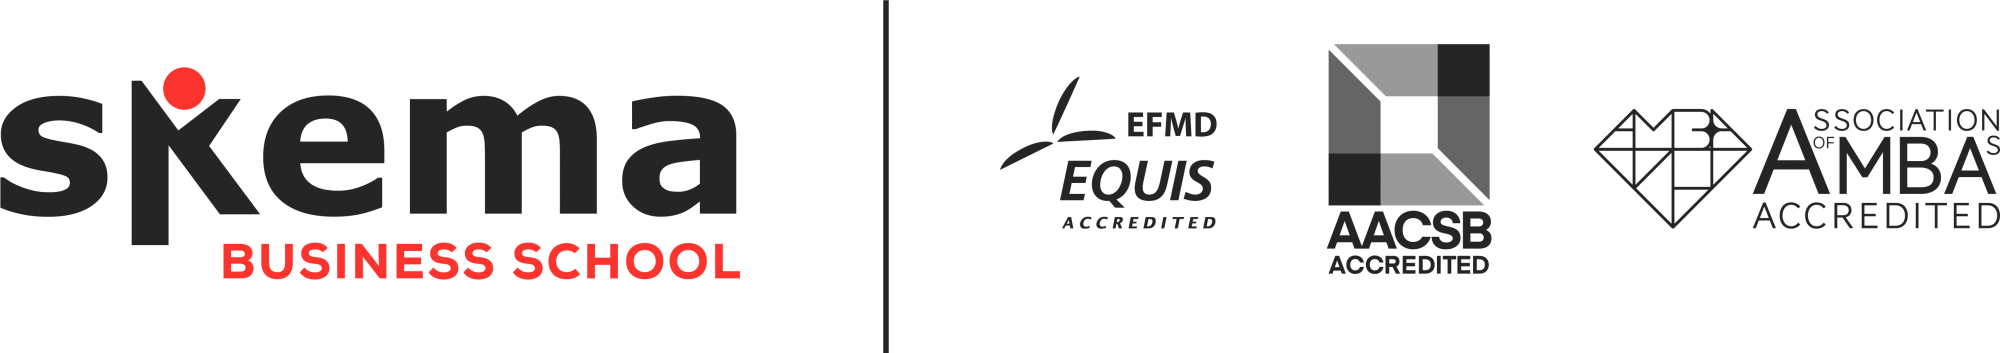 Skema Equis AACSB AMBA Accedited